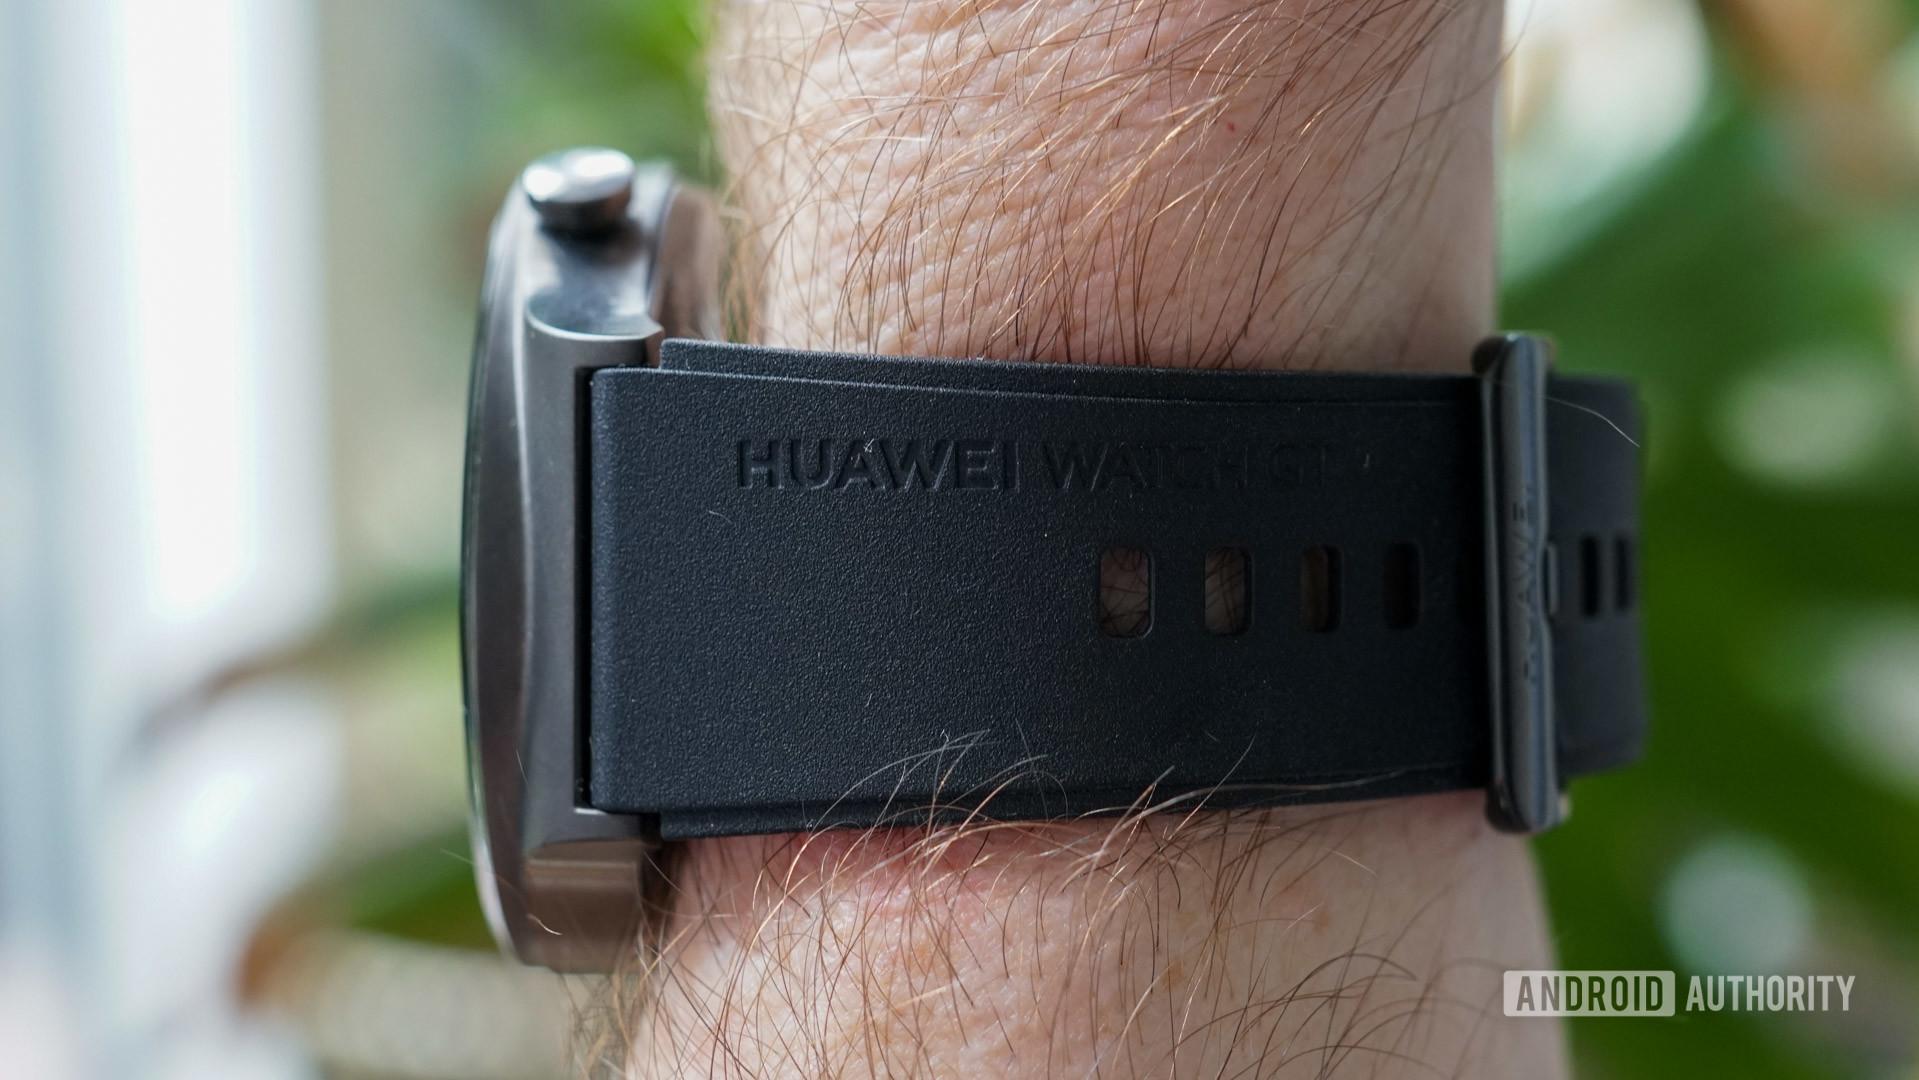 Huawei Watch GT 2 Pro smartwatch strap